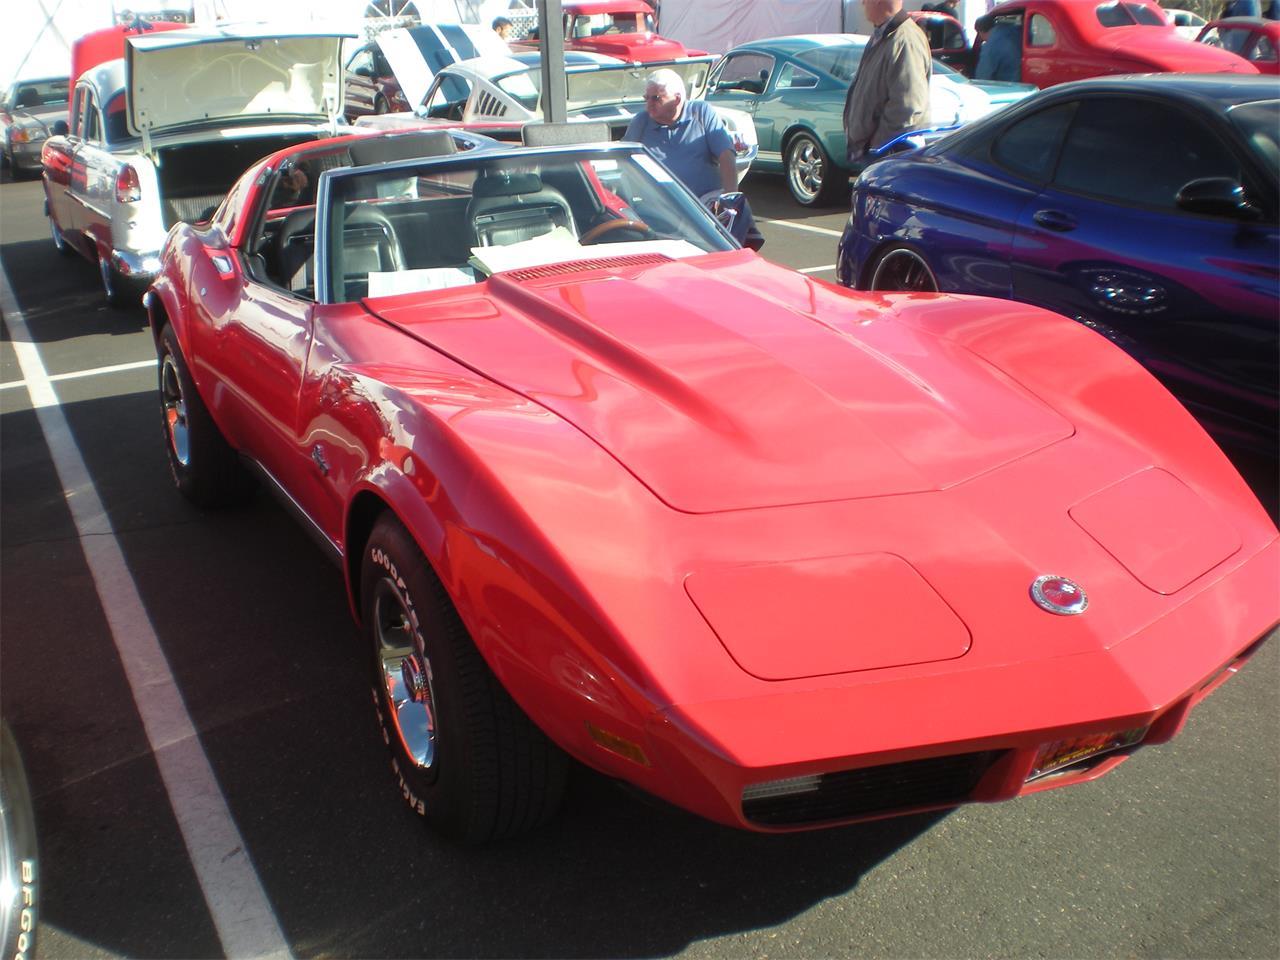 Chevrolet Corvette For Sale ClassicCarscom CC - Fountain hills car show